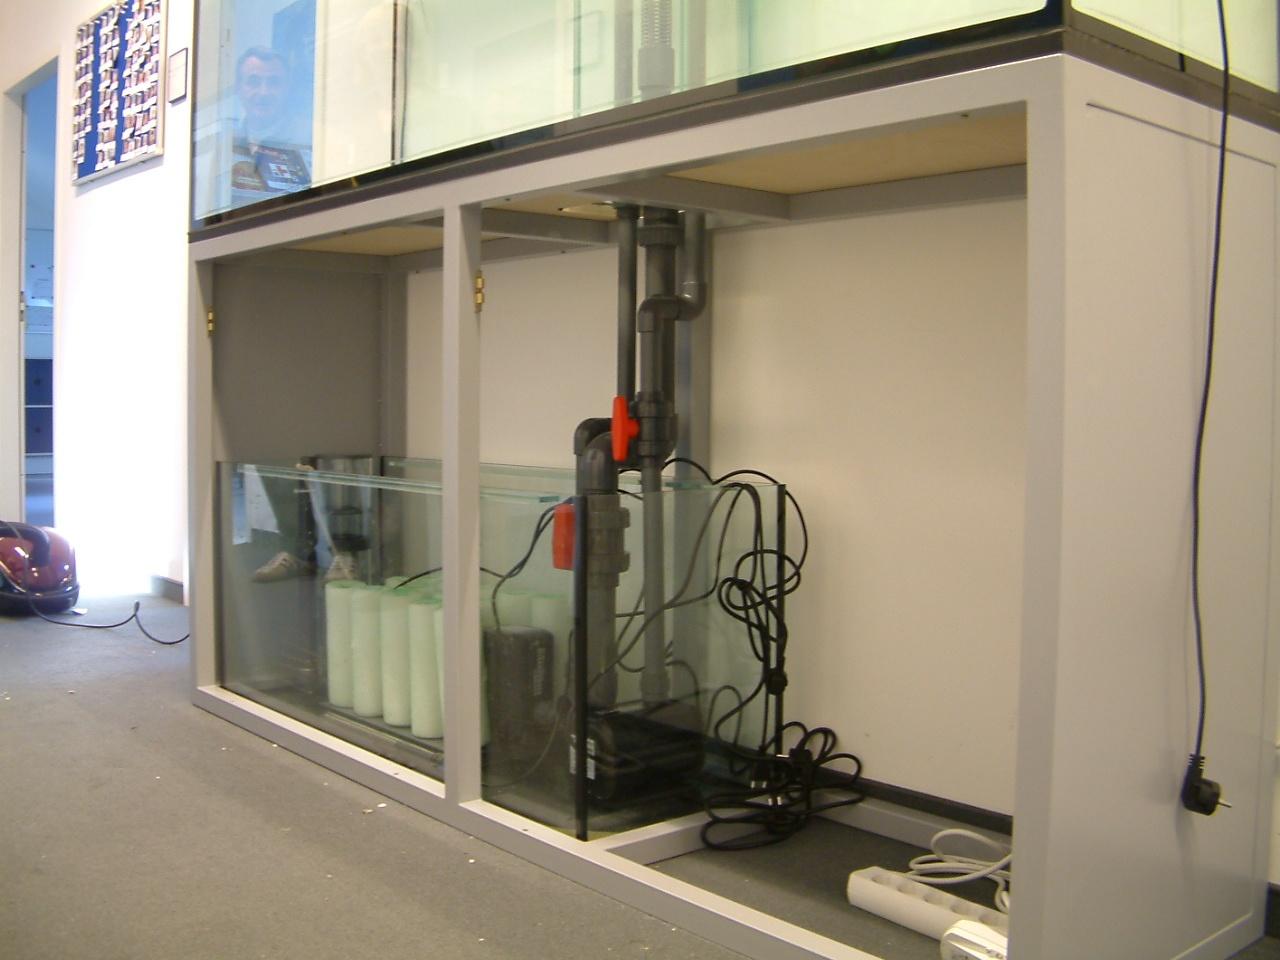 Technikbecken im Meerwasseraquarium Aquariumbau München